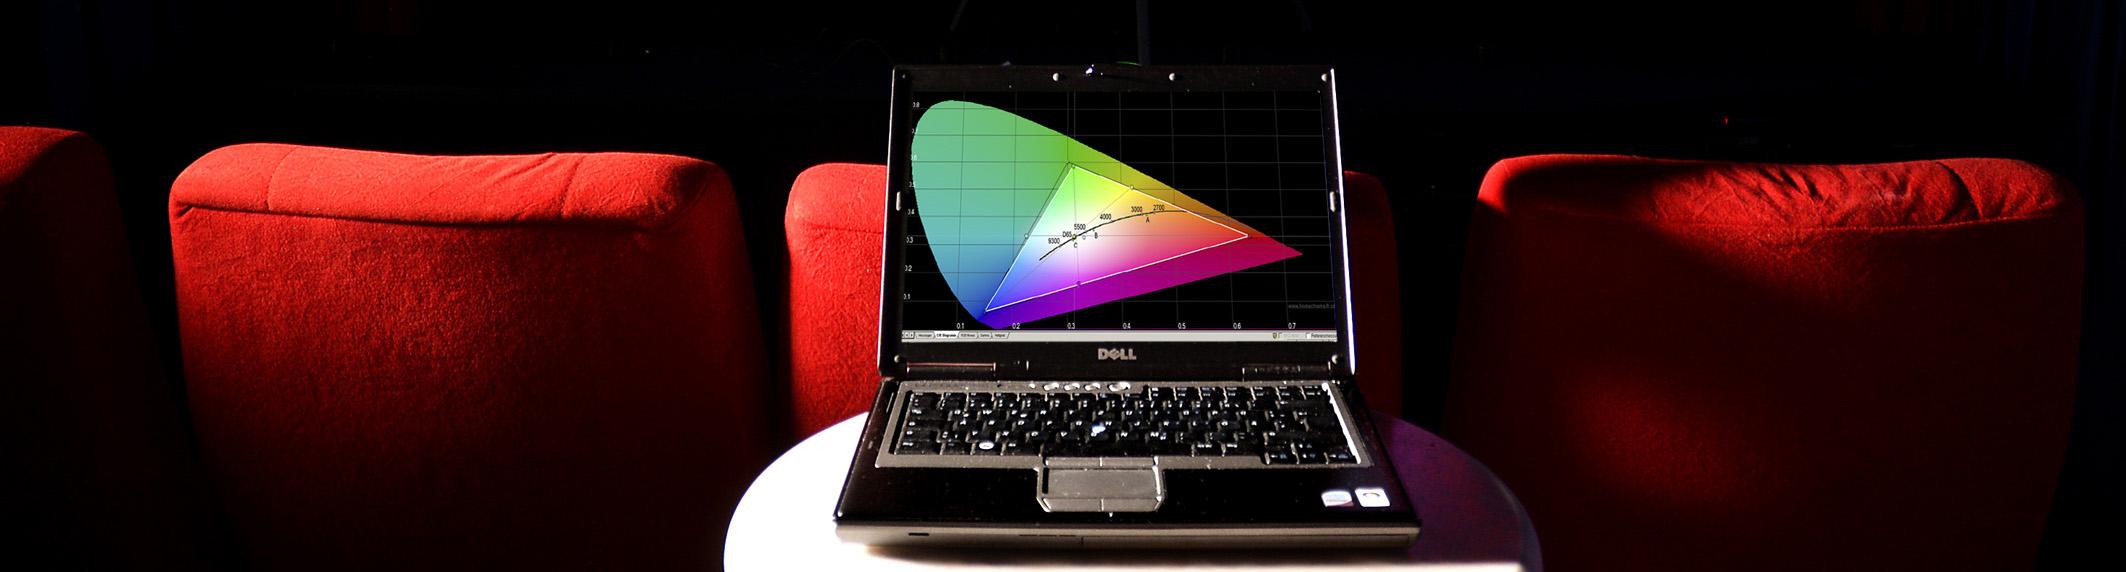 Projektoren-Kalibrierungsaufbau - Foto Michael B Rehders_MBR3284